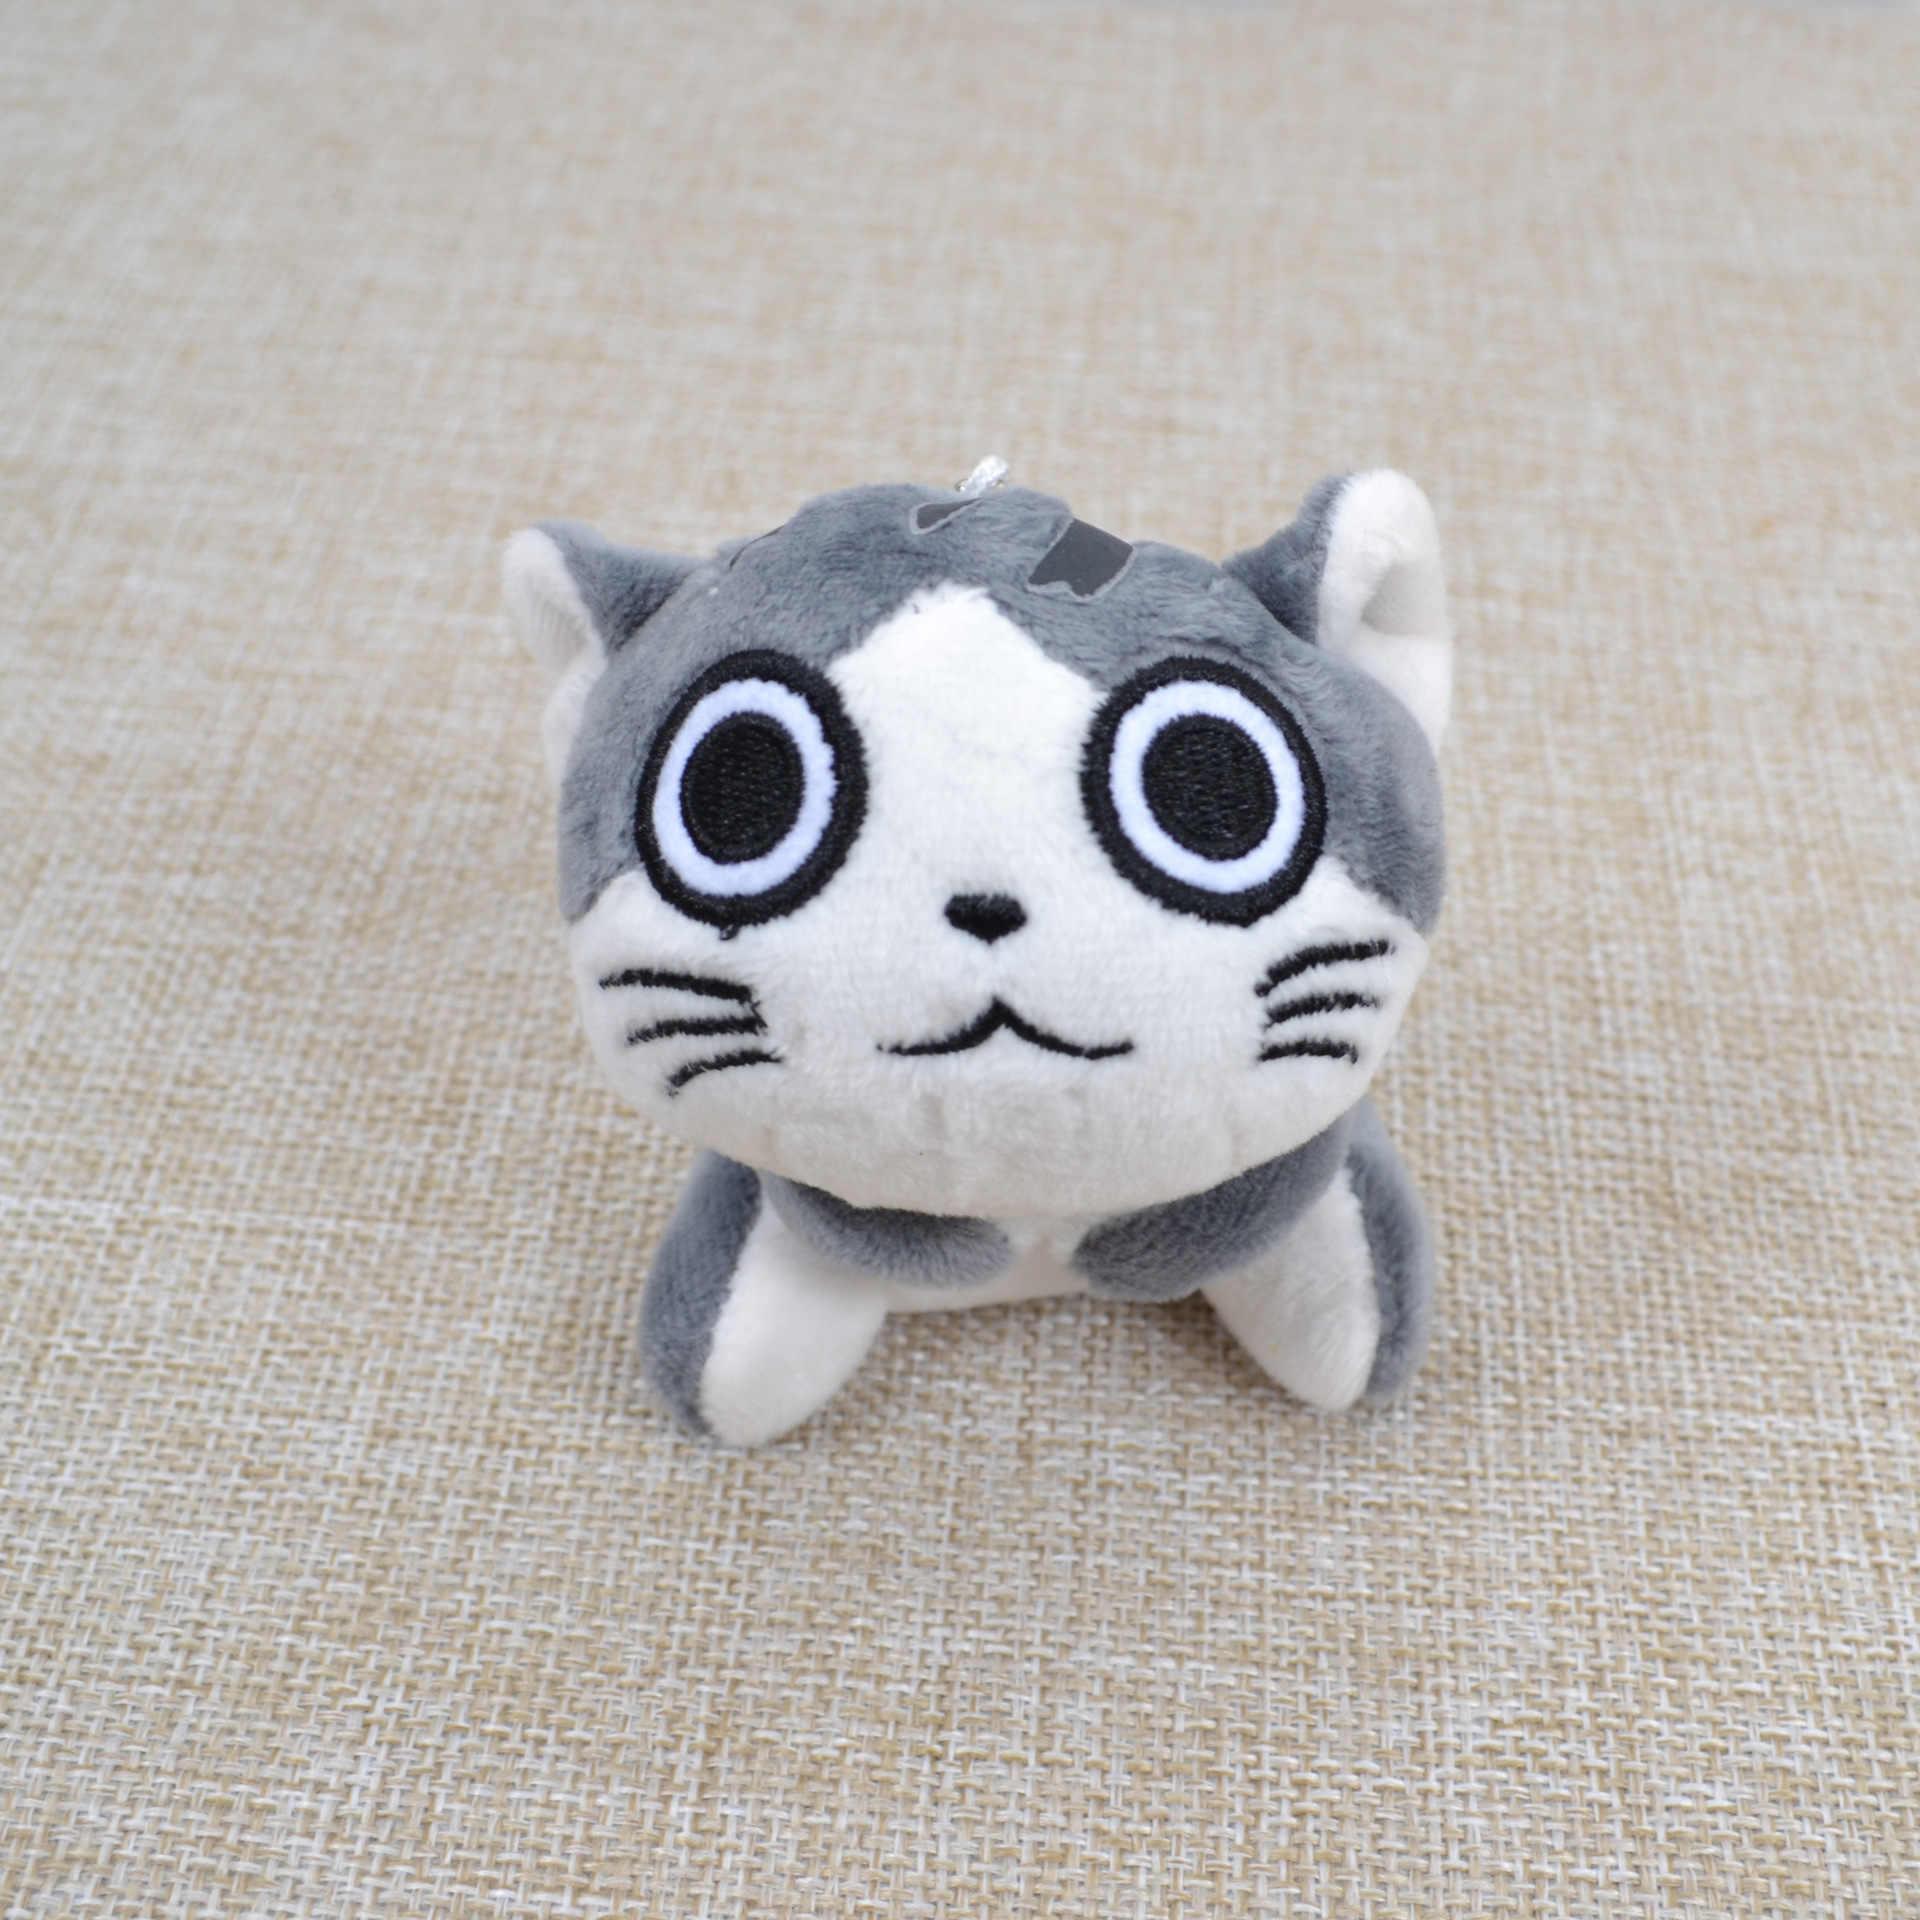 Cinza sentado 9 cm gato pelúcia brinquedos buquê presente macio pelúcia gato boneca gato chaveiro brinquedo de pelúcia flor gato boneca presente kawaii